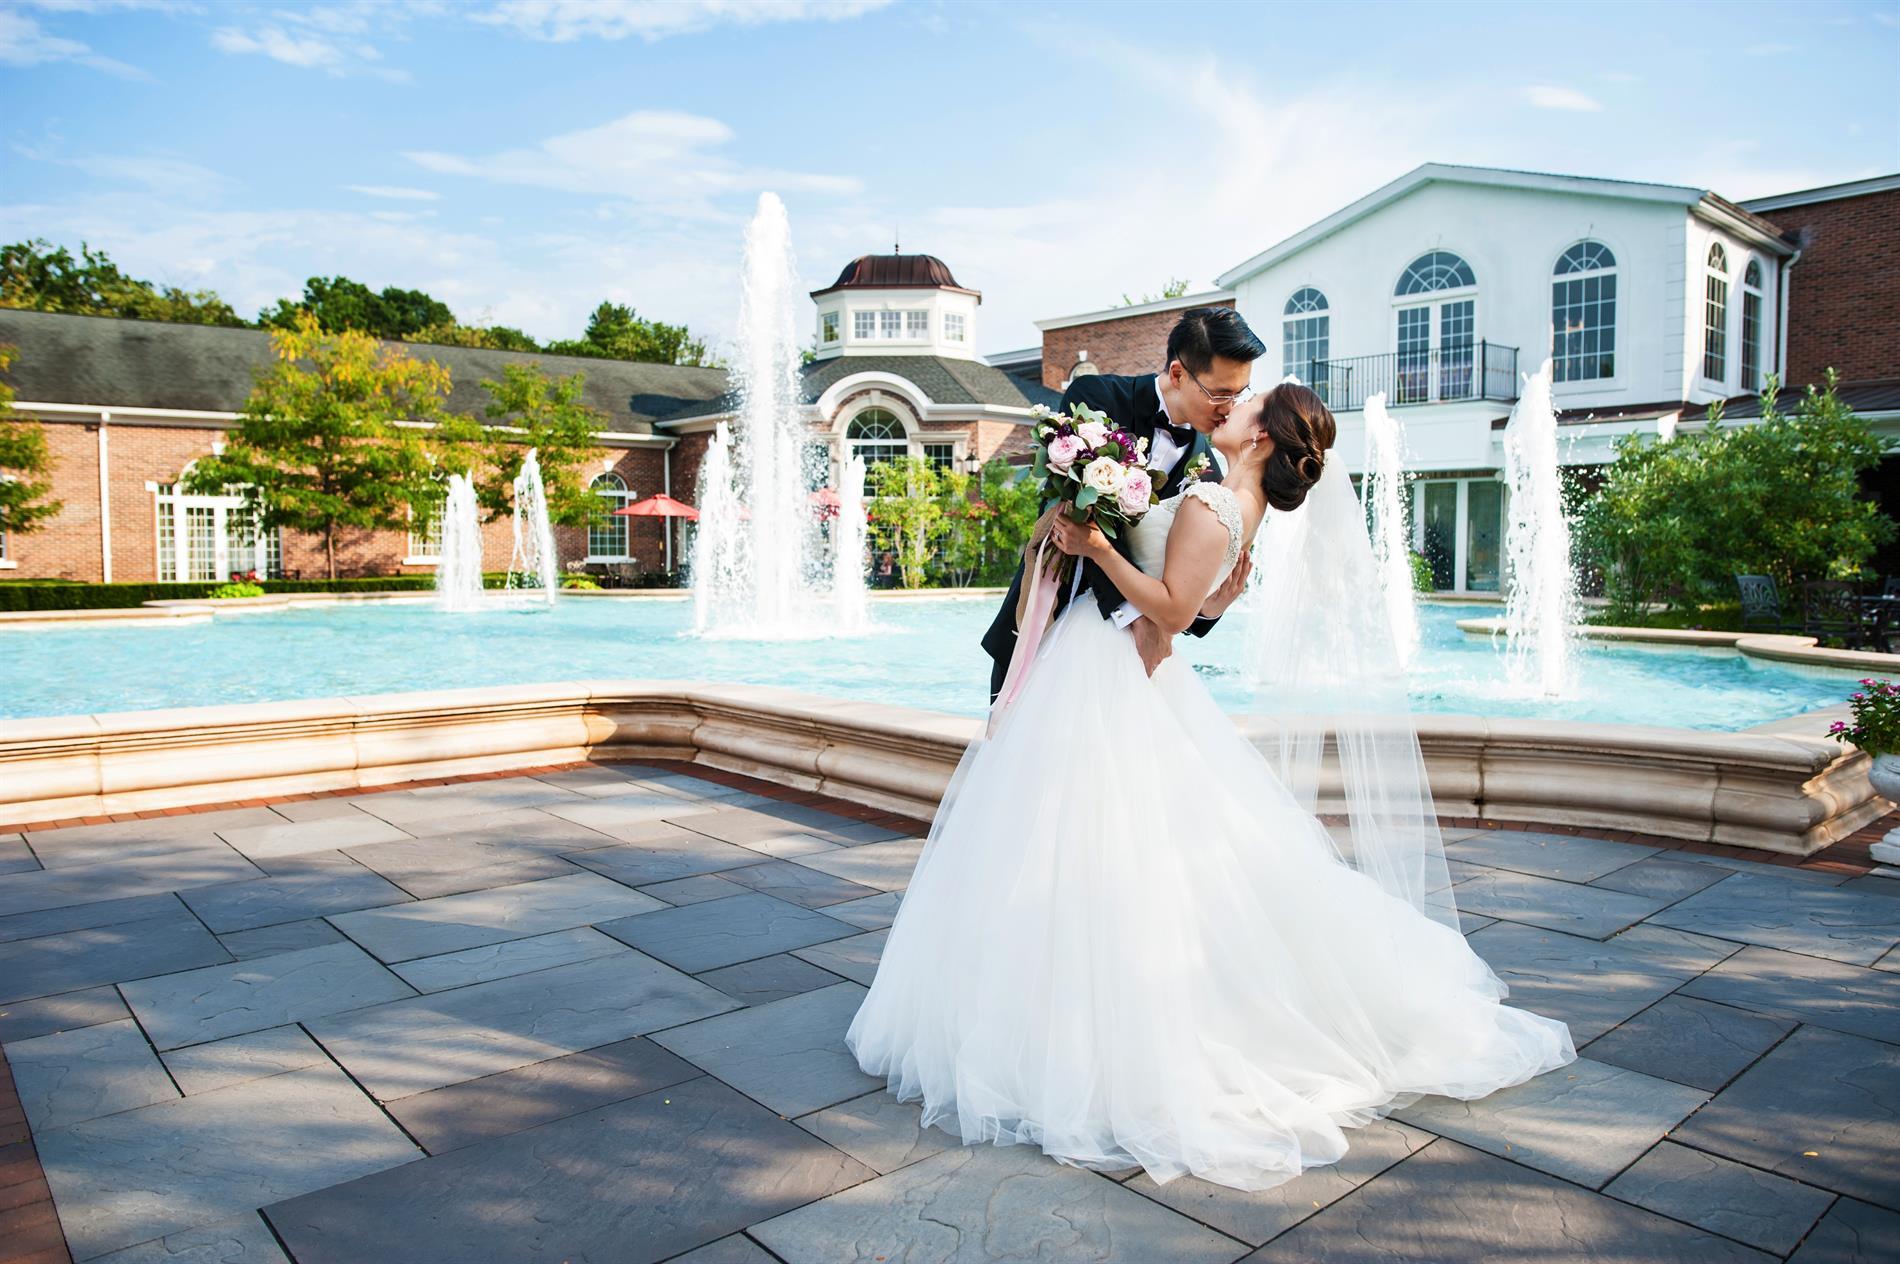 Jae and Jenny Wedding Photos